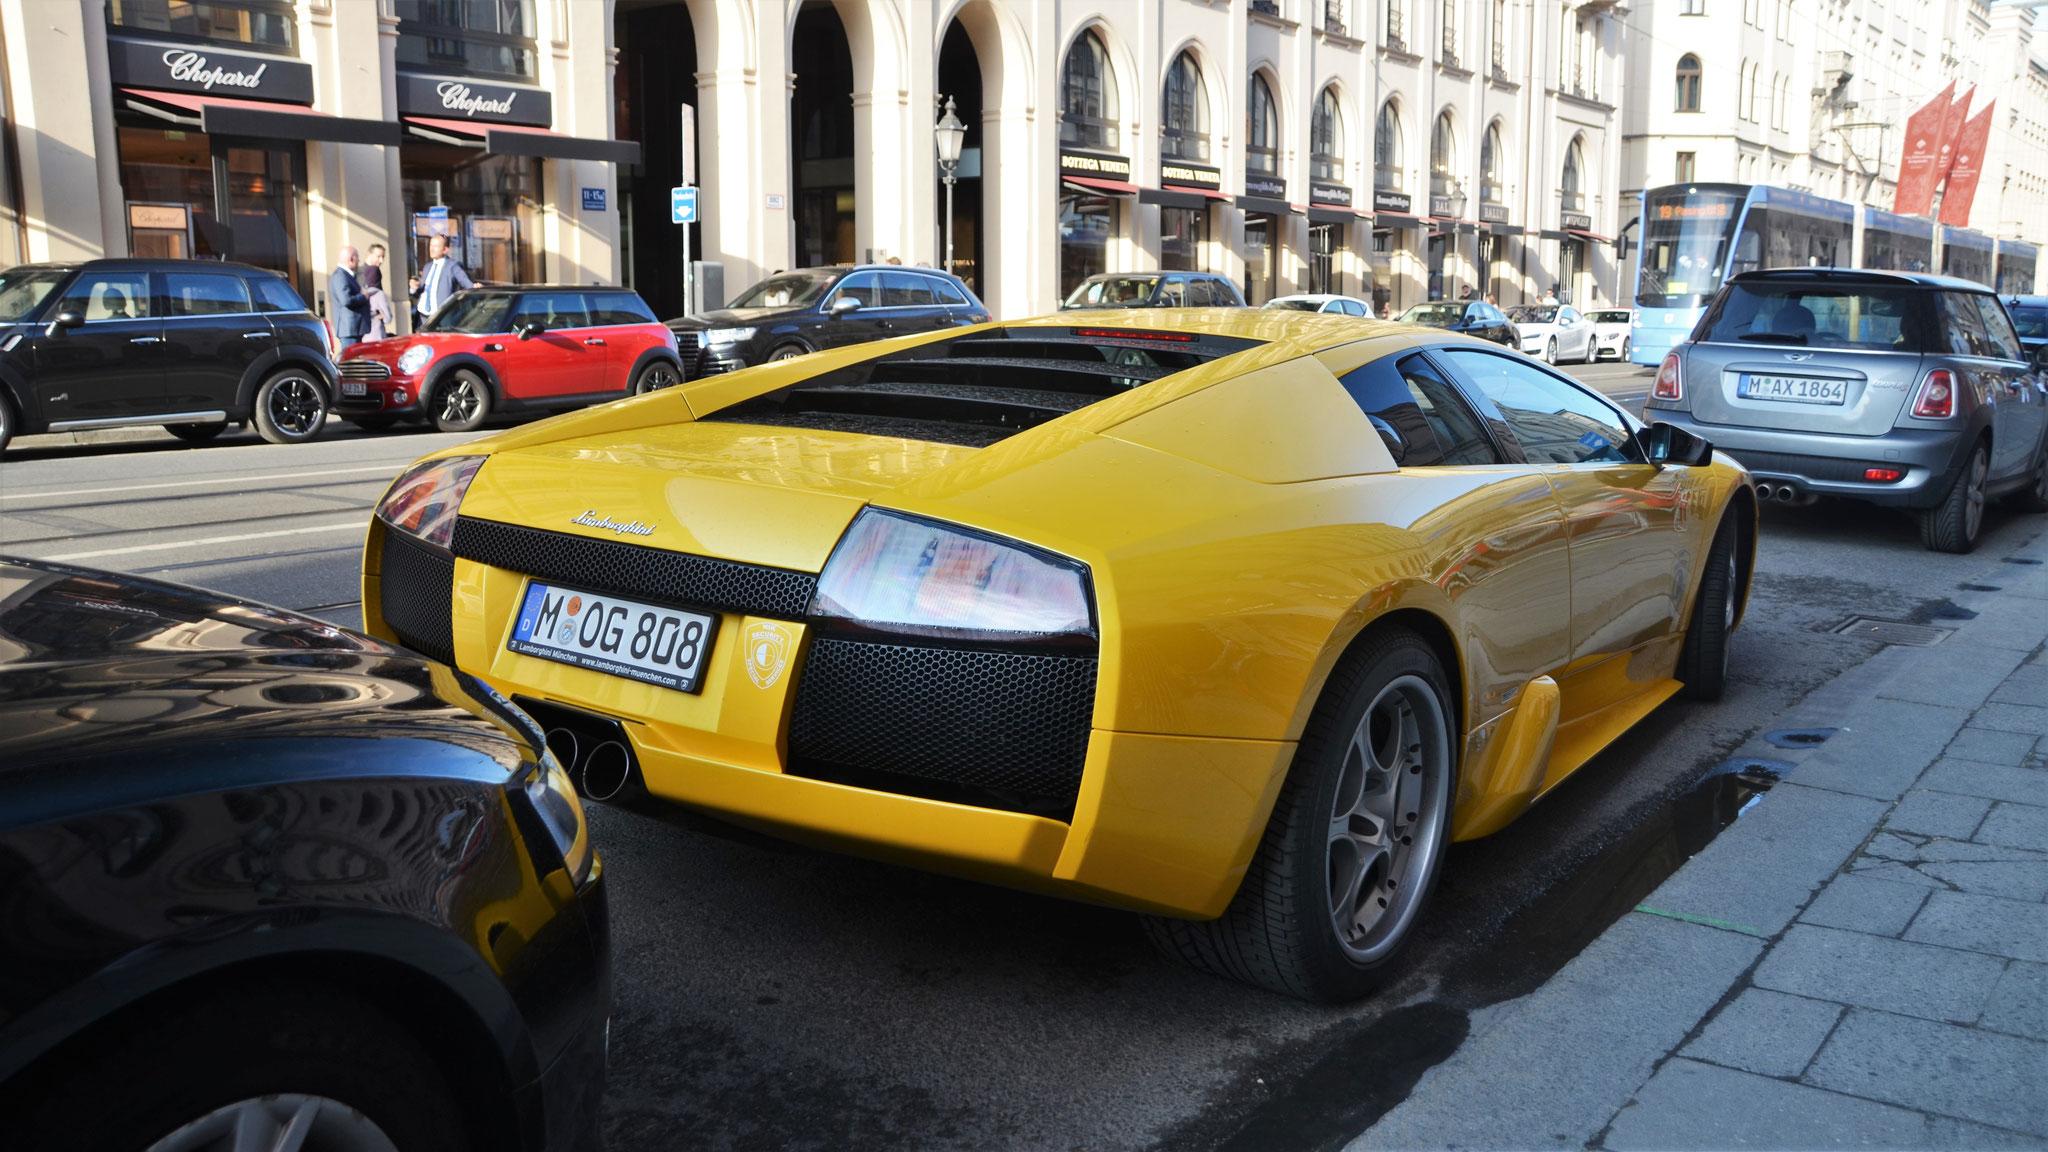 Lamborghini Murcielago - M-OG-808